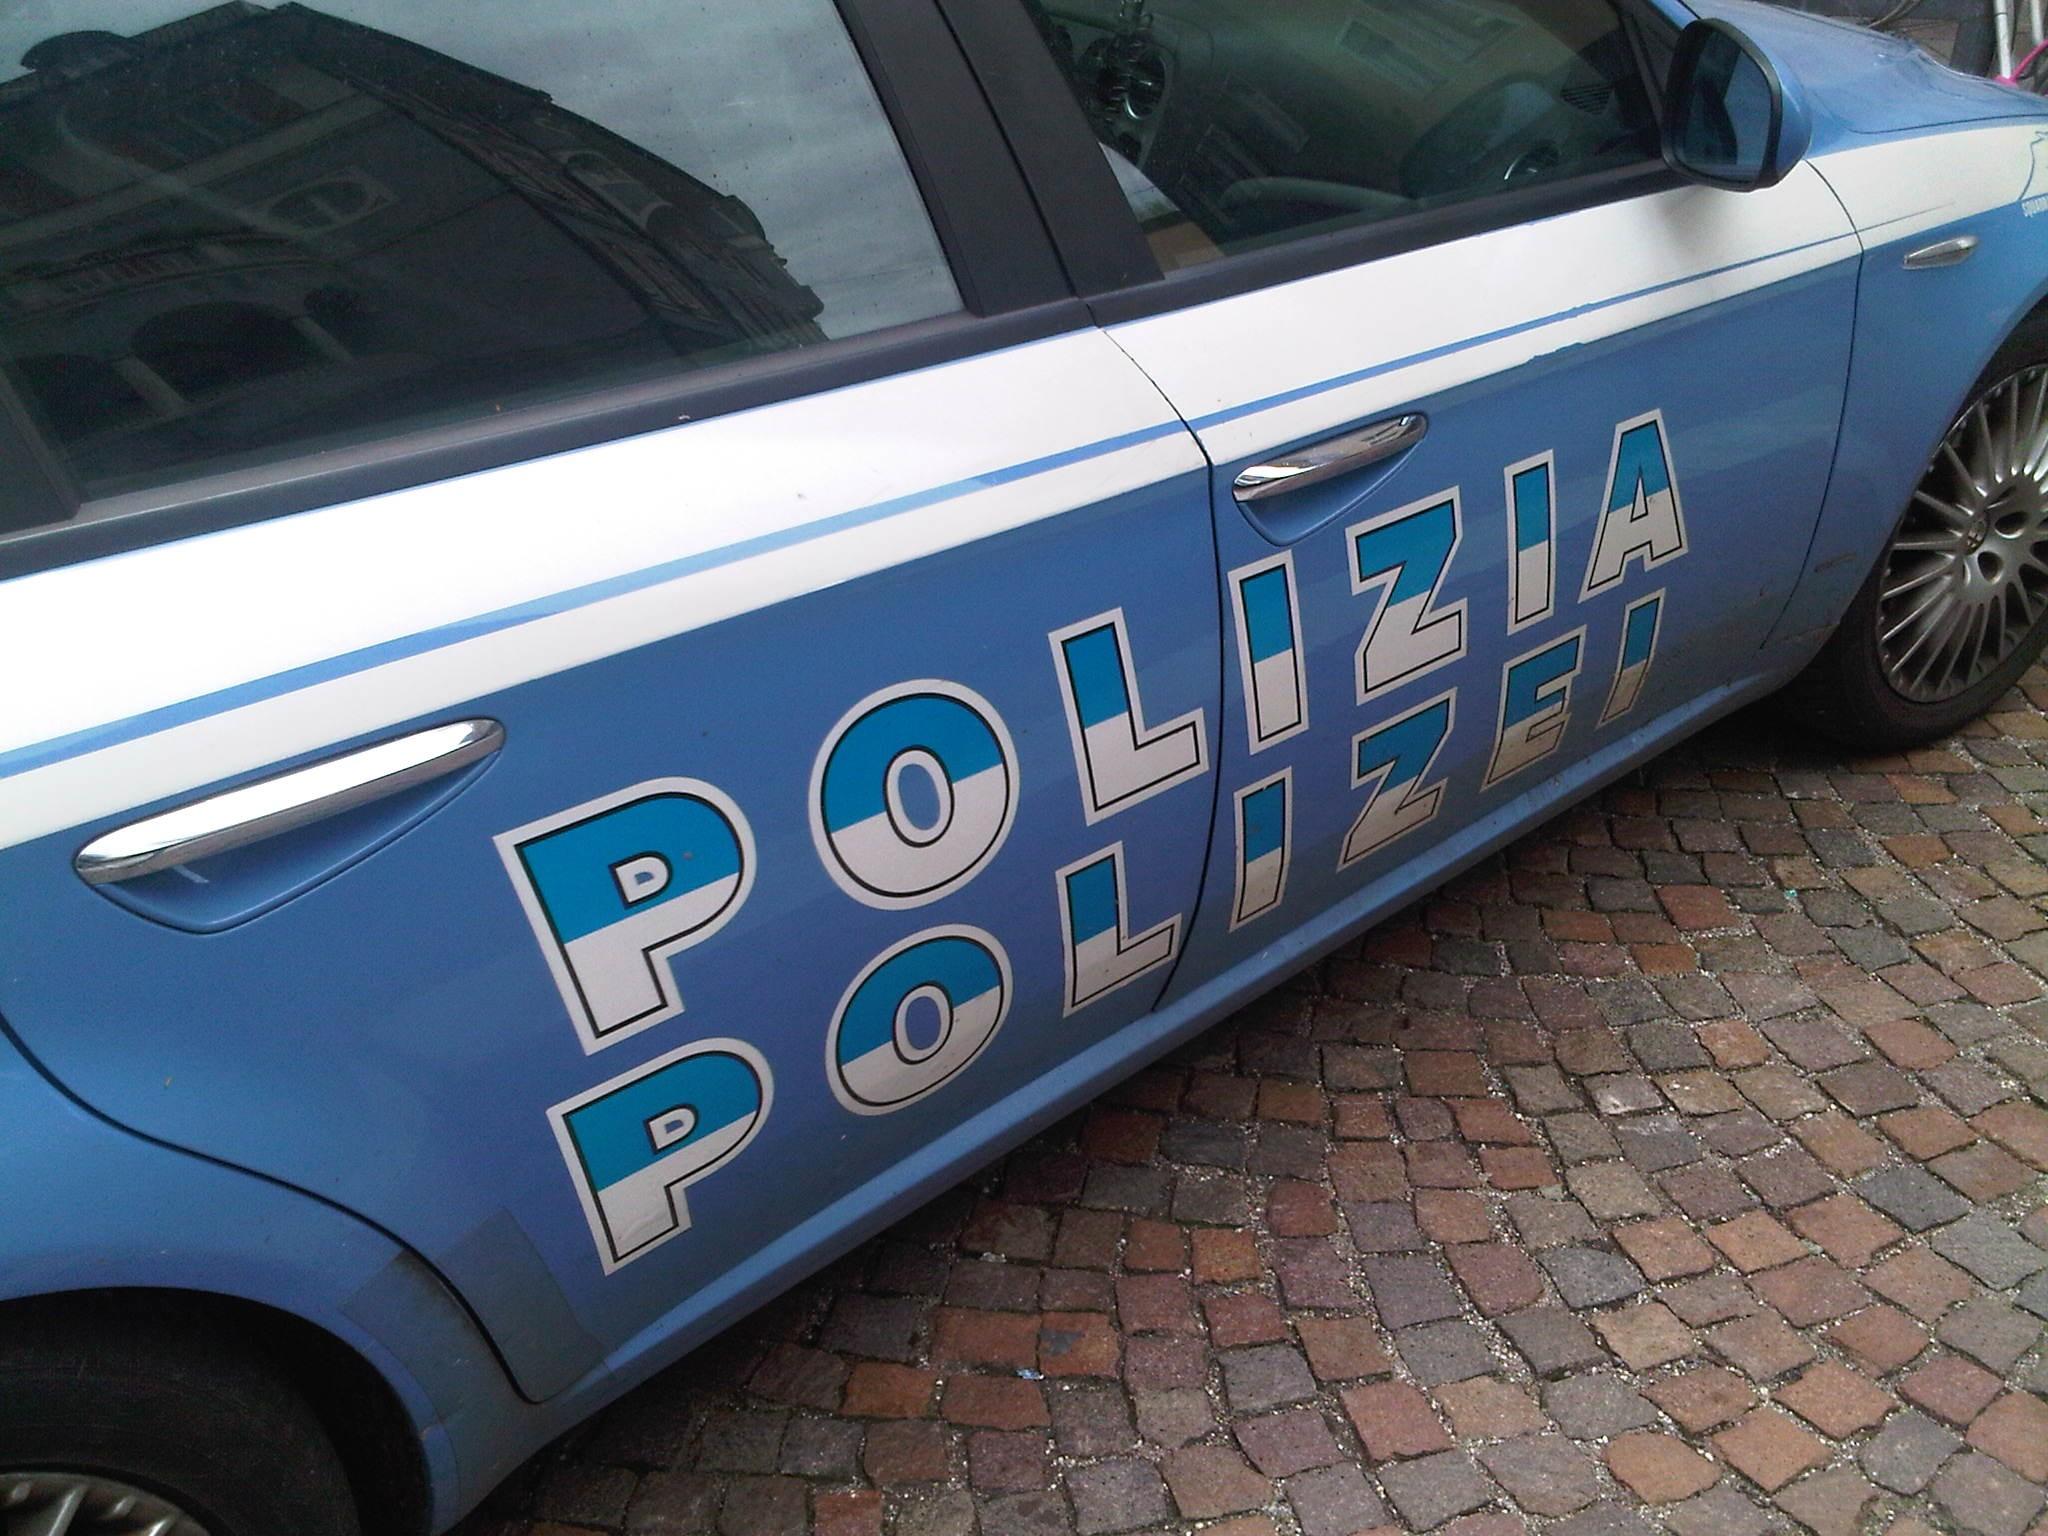 polizeiauto f&uuml